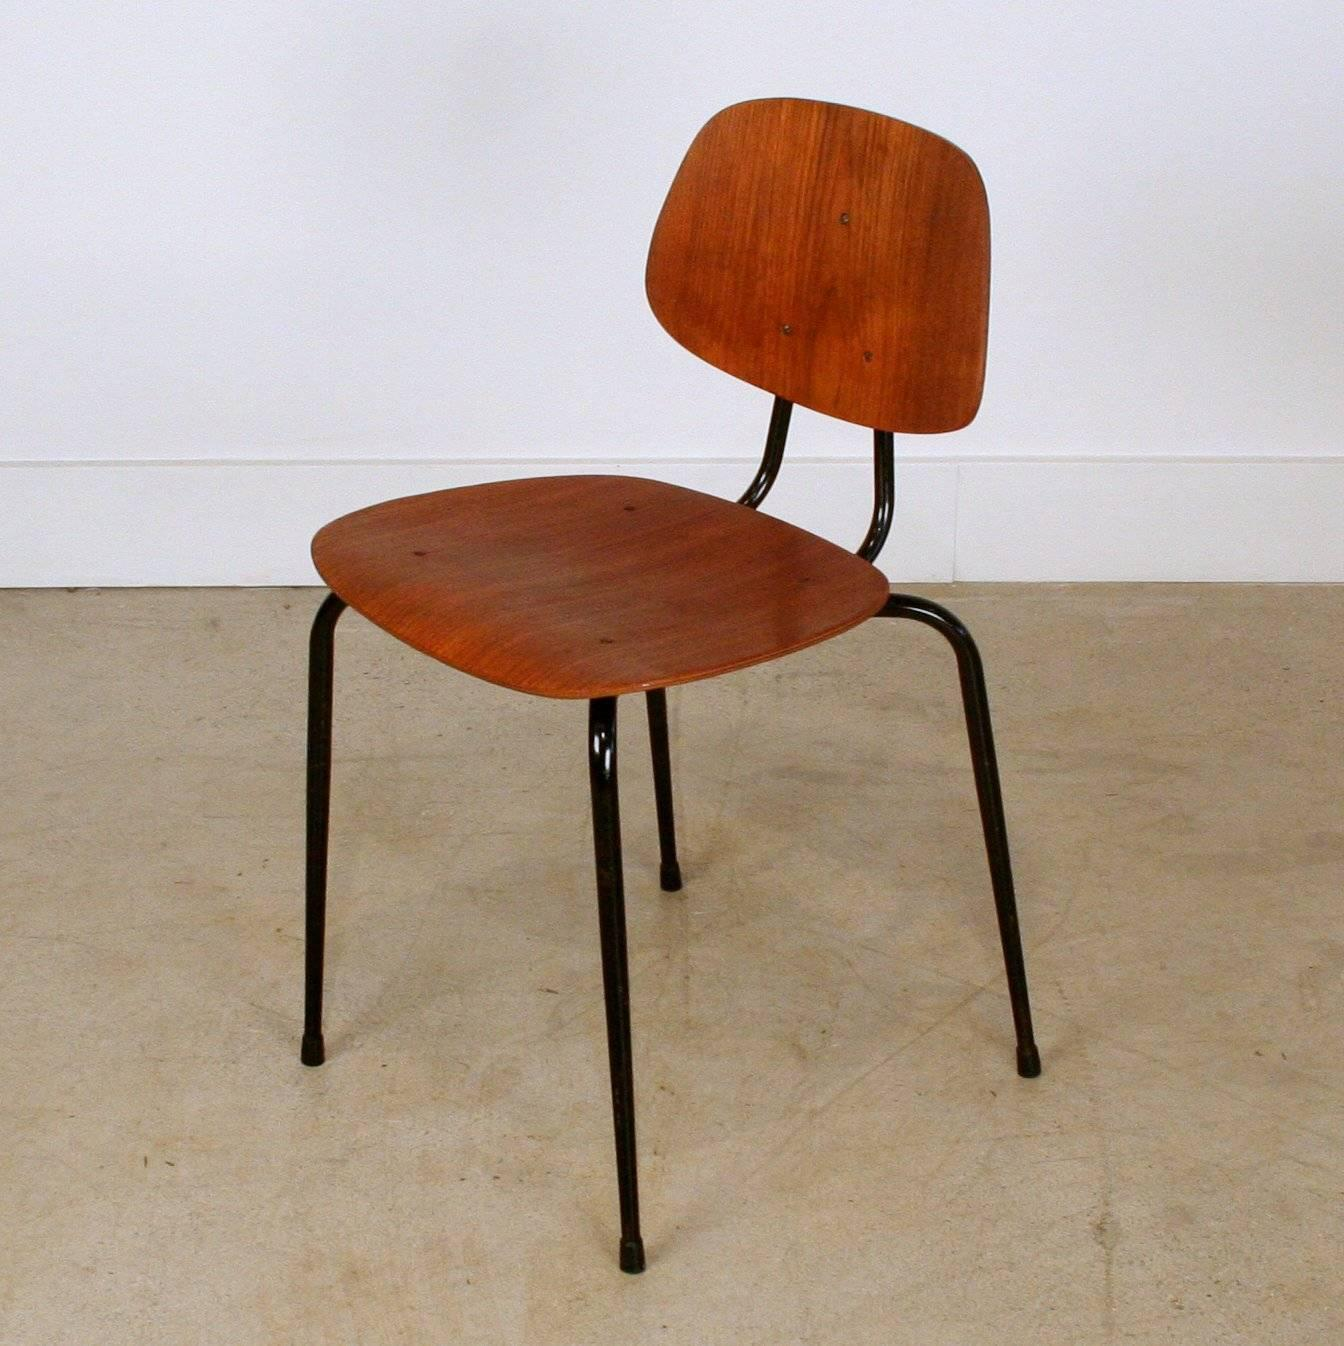 Vintage Teak and Metal School Chair For Sale at 1stdibs